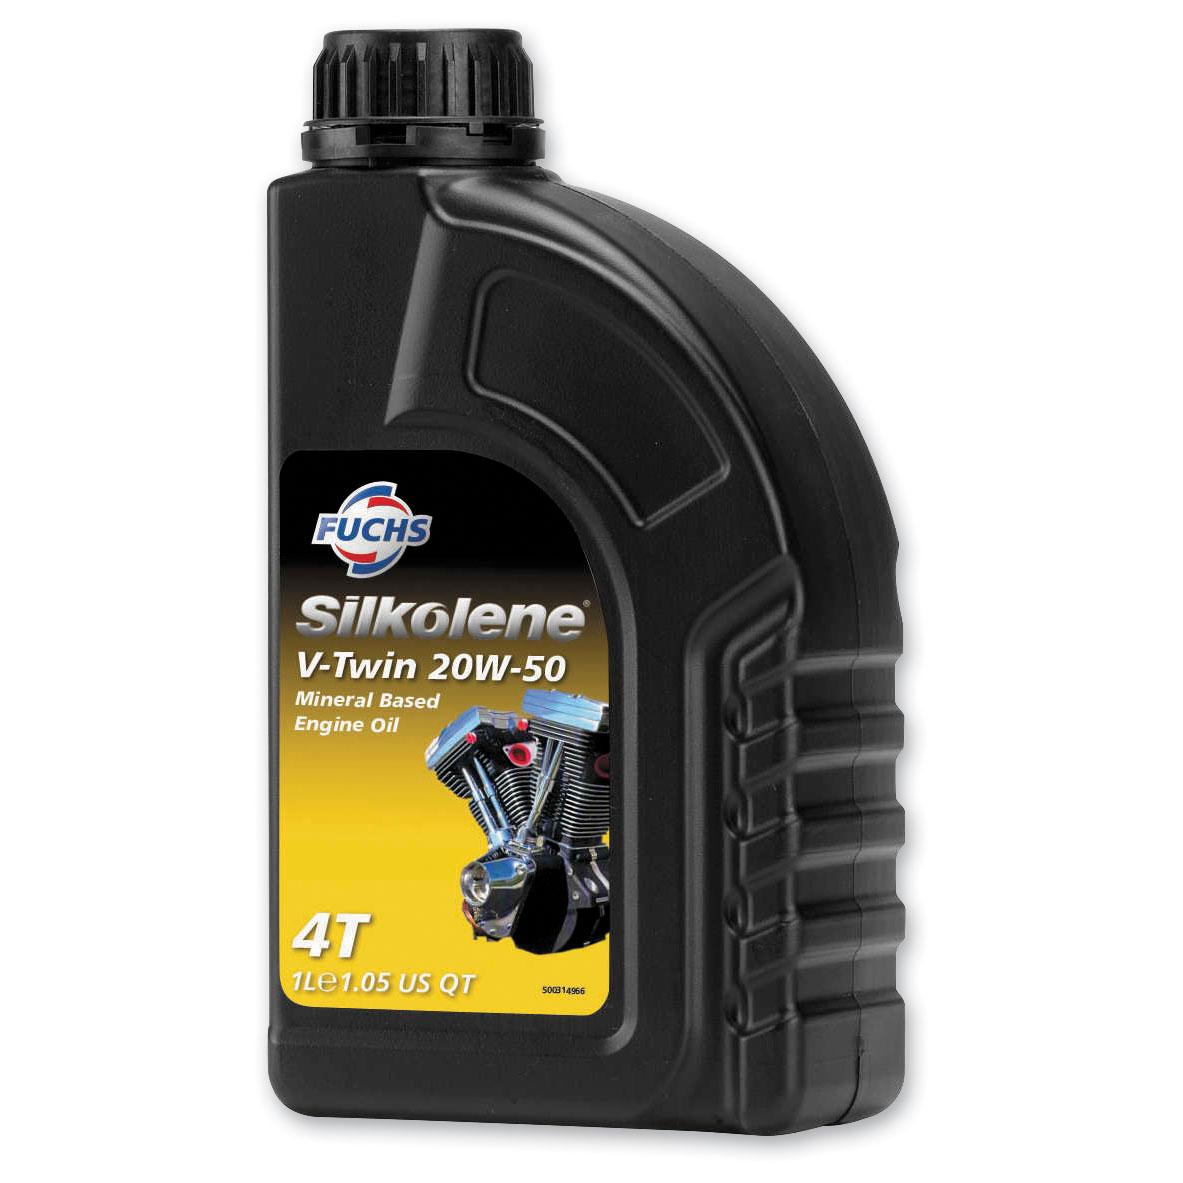 Silkolene V-Twin 20W50 Engine Oil 4L